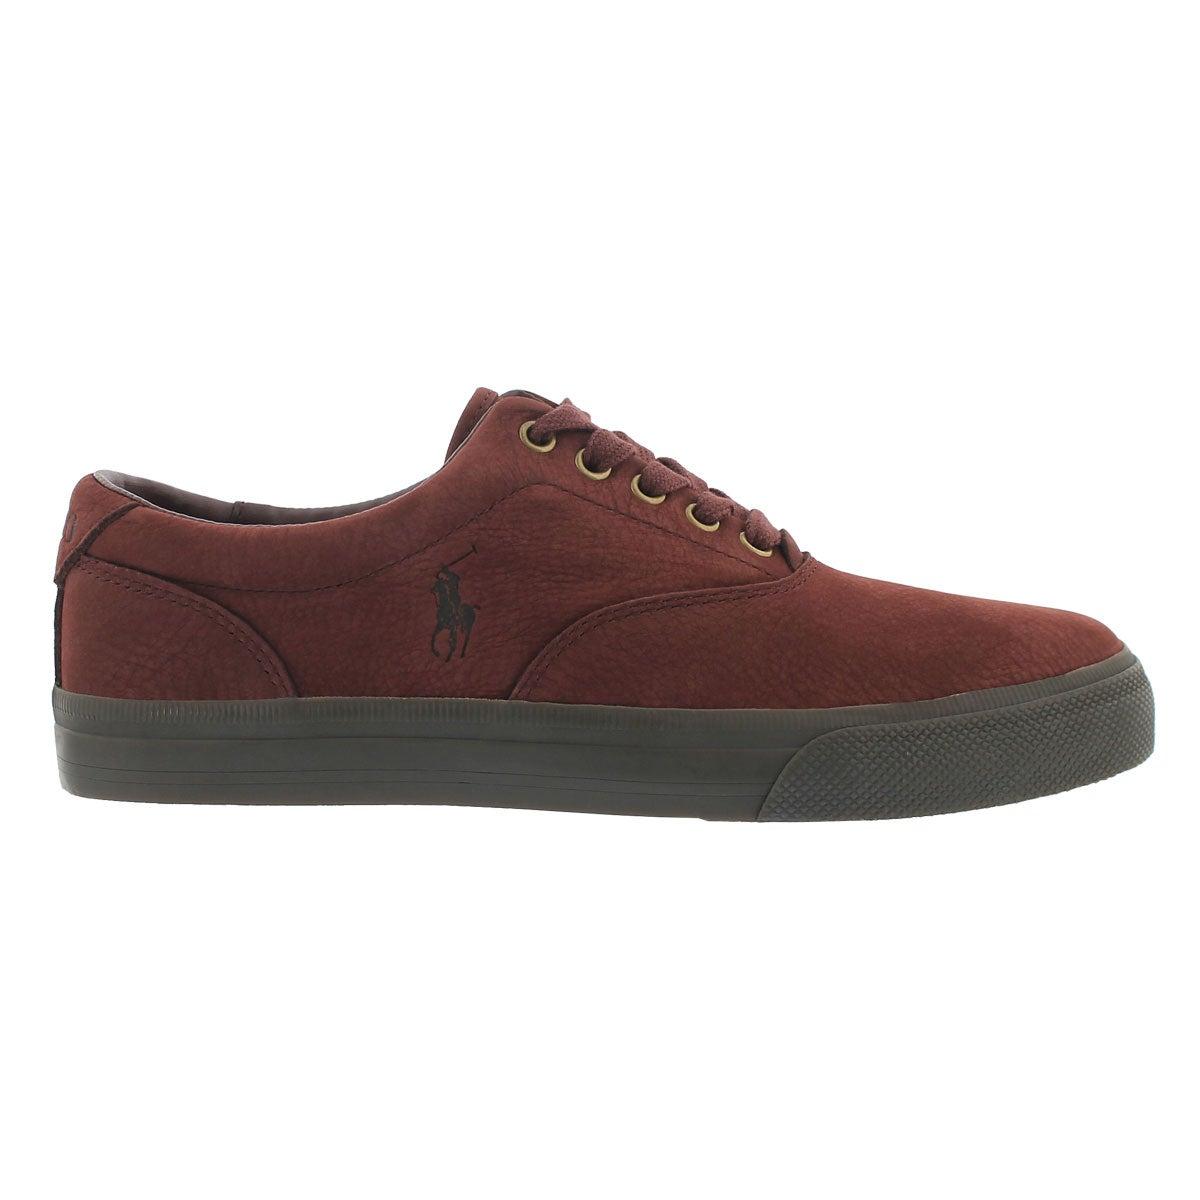 Mns Vaughn port lace up sneaker